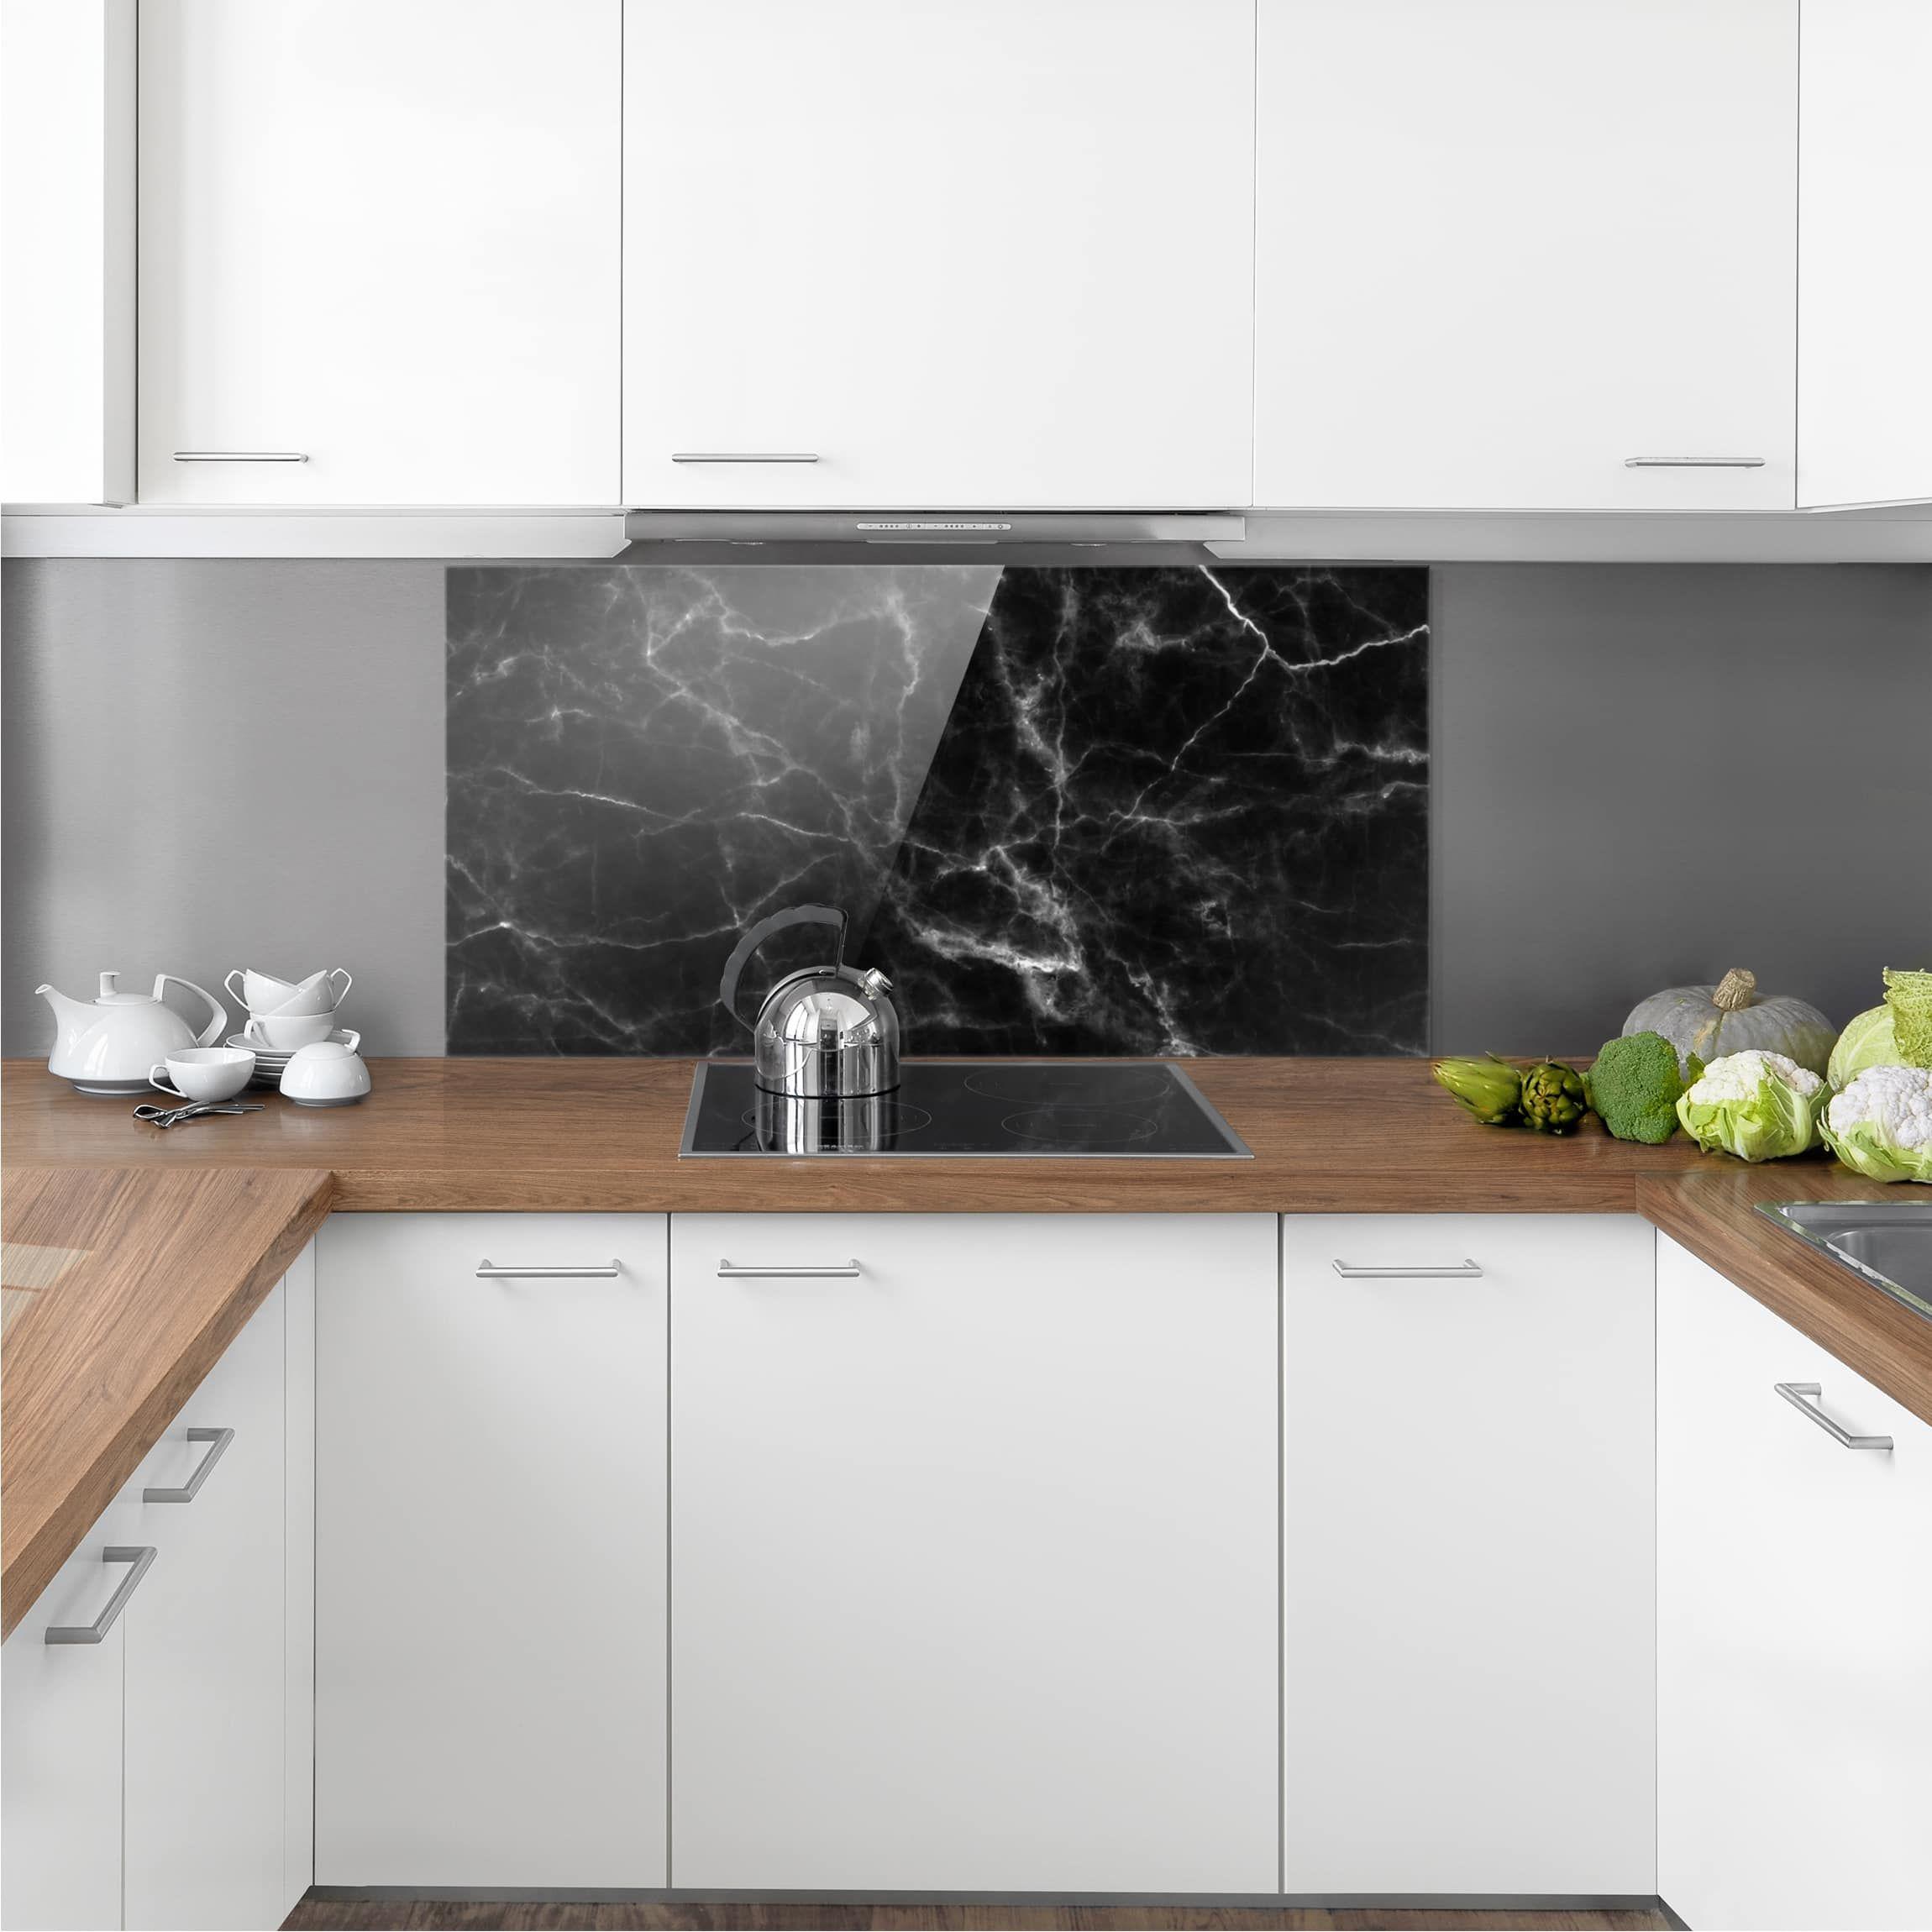 Paraschizzi Per Cucina In Vetro.Paraschizzi In Vetro Nero Carrara Orizzontale 1 2 Nel